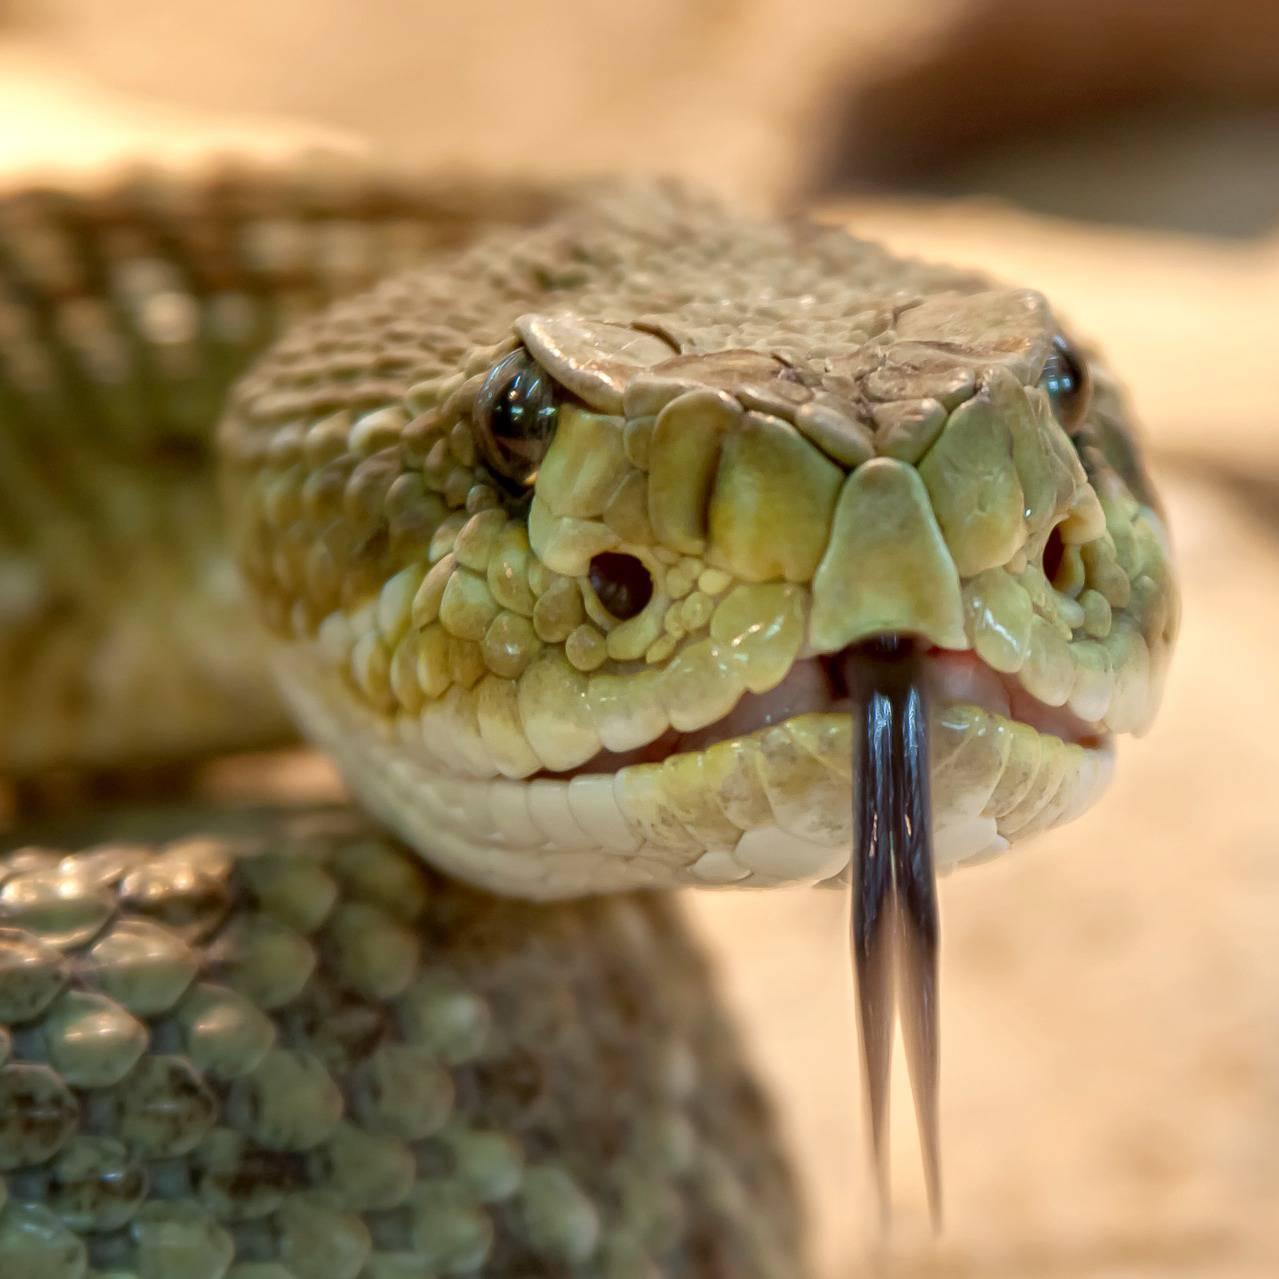 Prince-Serpent